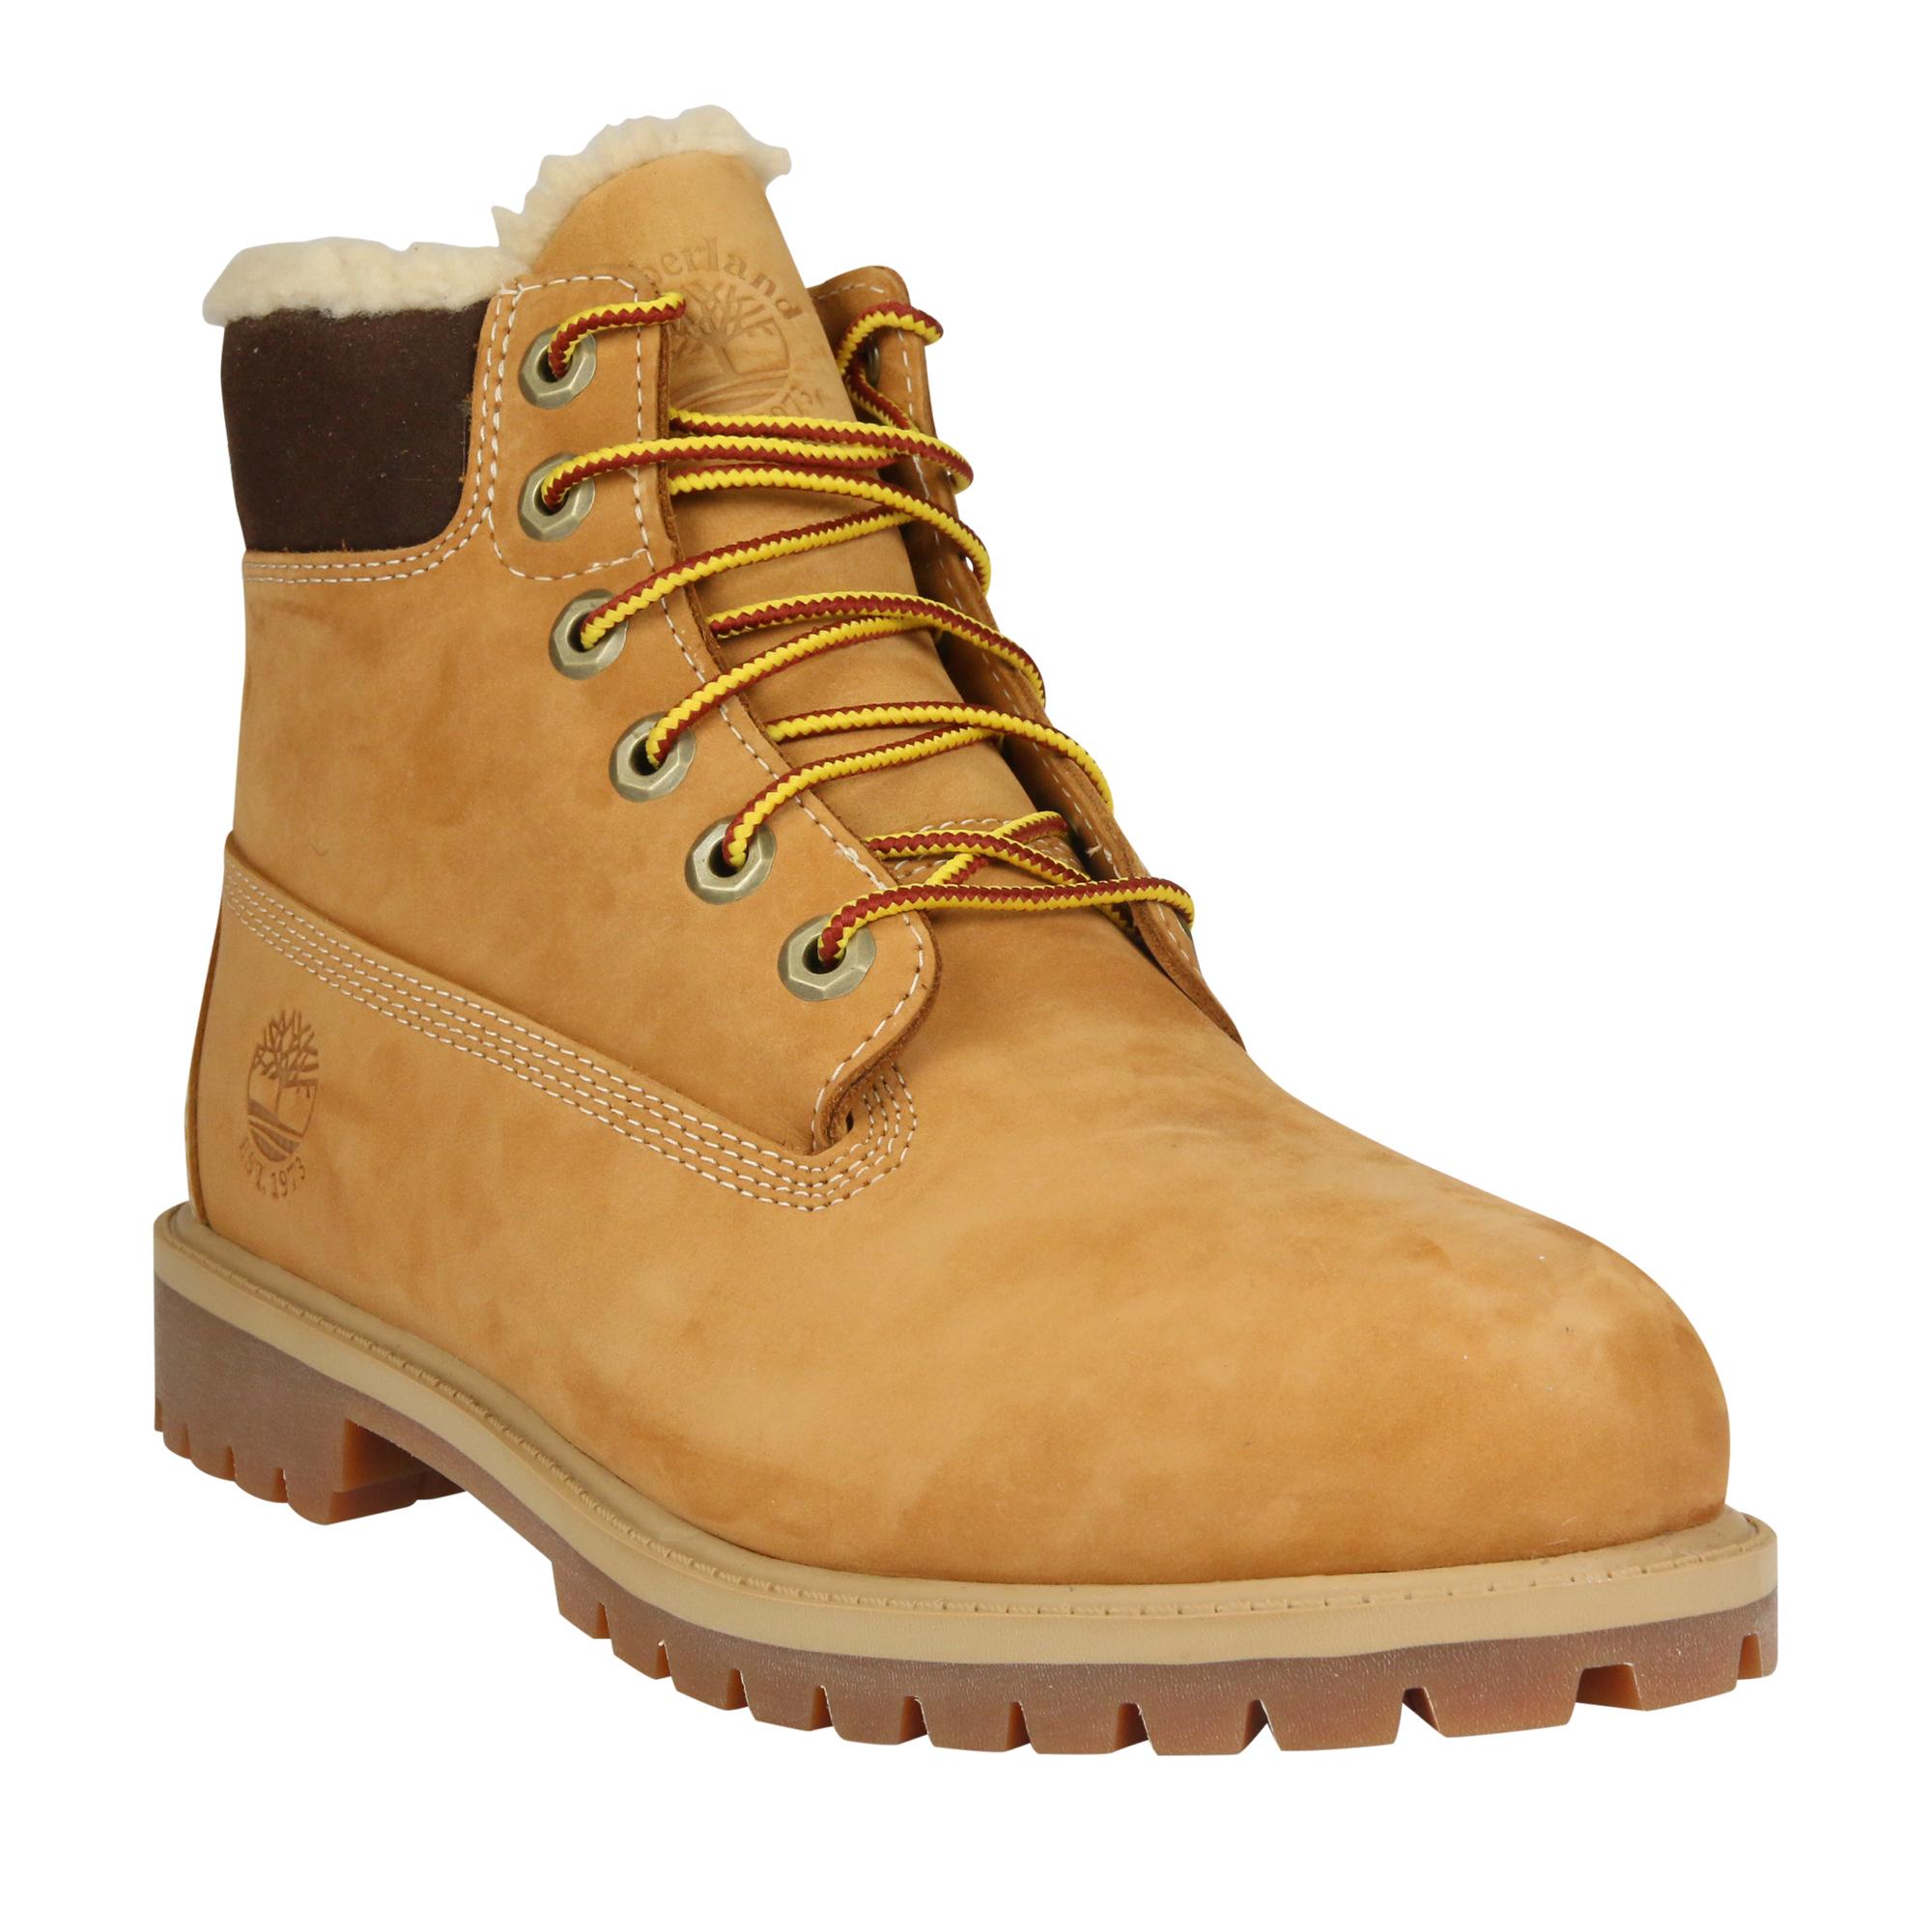 Timberland-6-Inch-Junior-Classic-Waterproof-Boot-Schuhe-Winterstiefel-Madchen